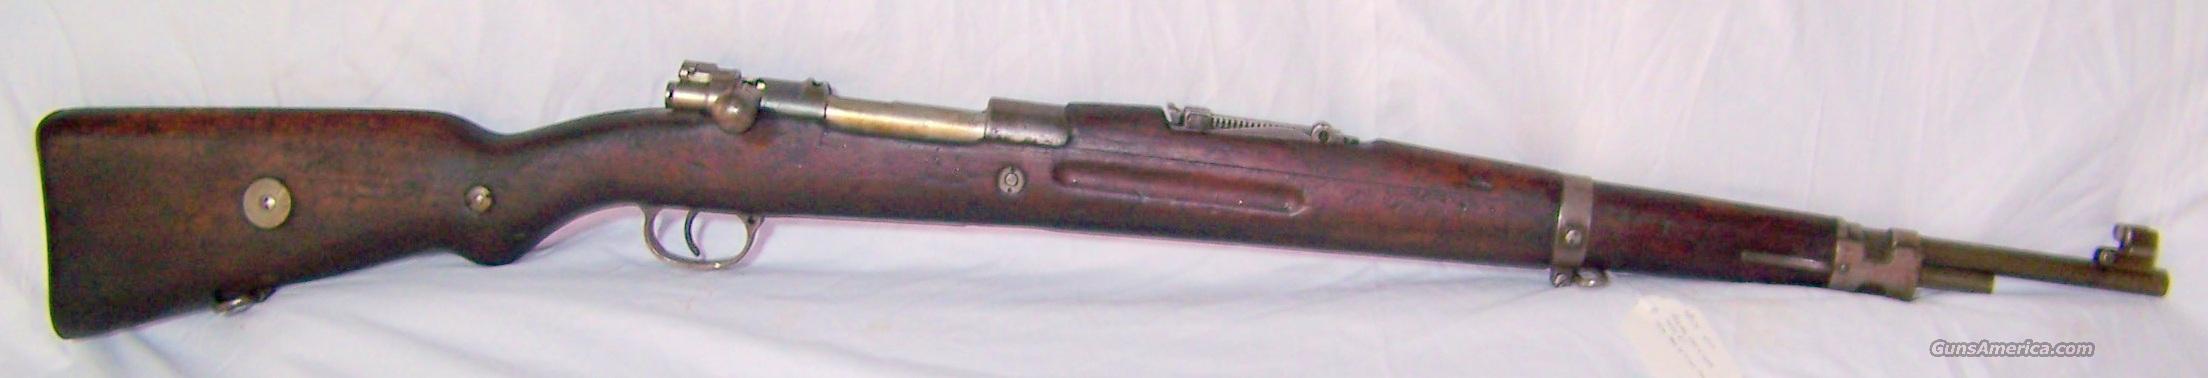 VZ.24 8mm Mauser  Guns > Rifles > Military Misc. Rifles Non-US > Other